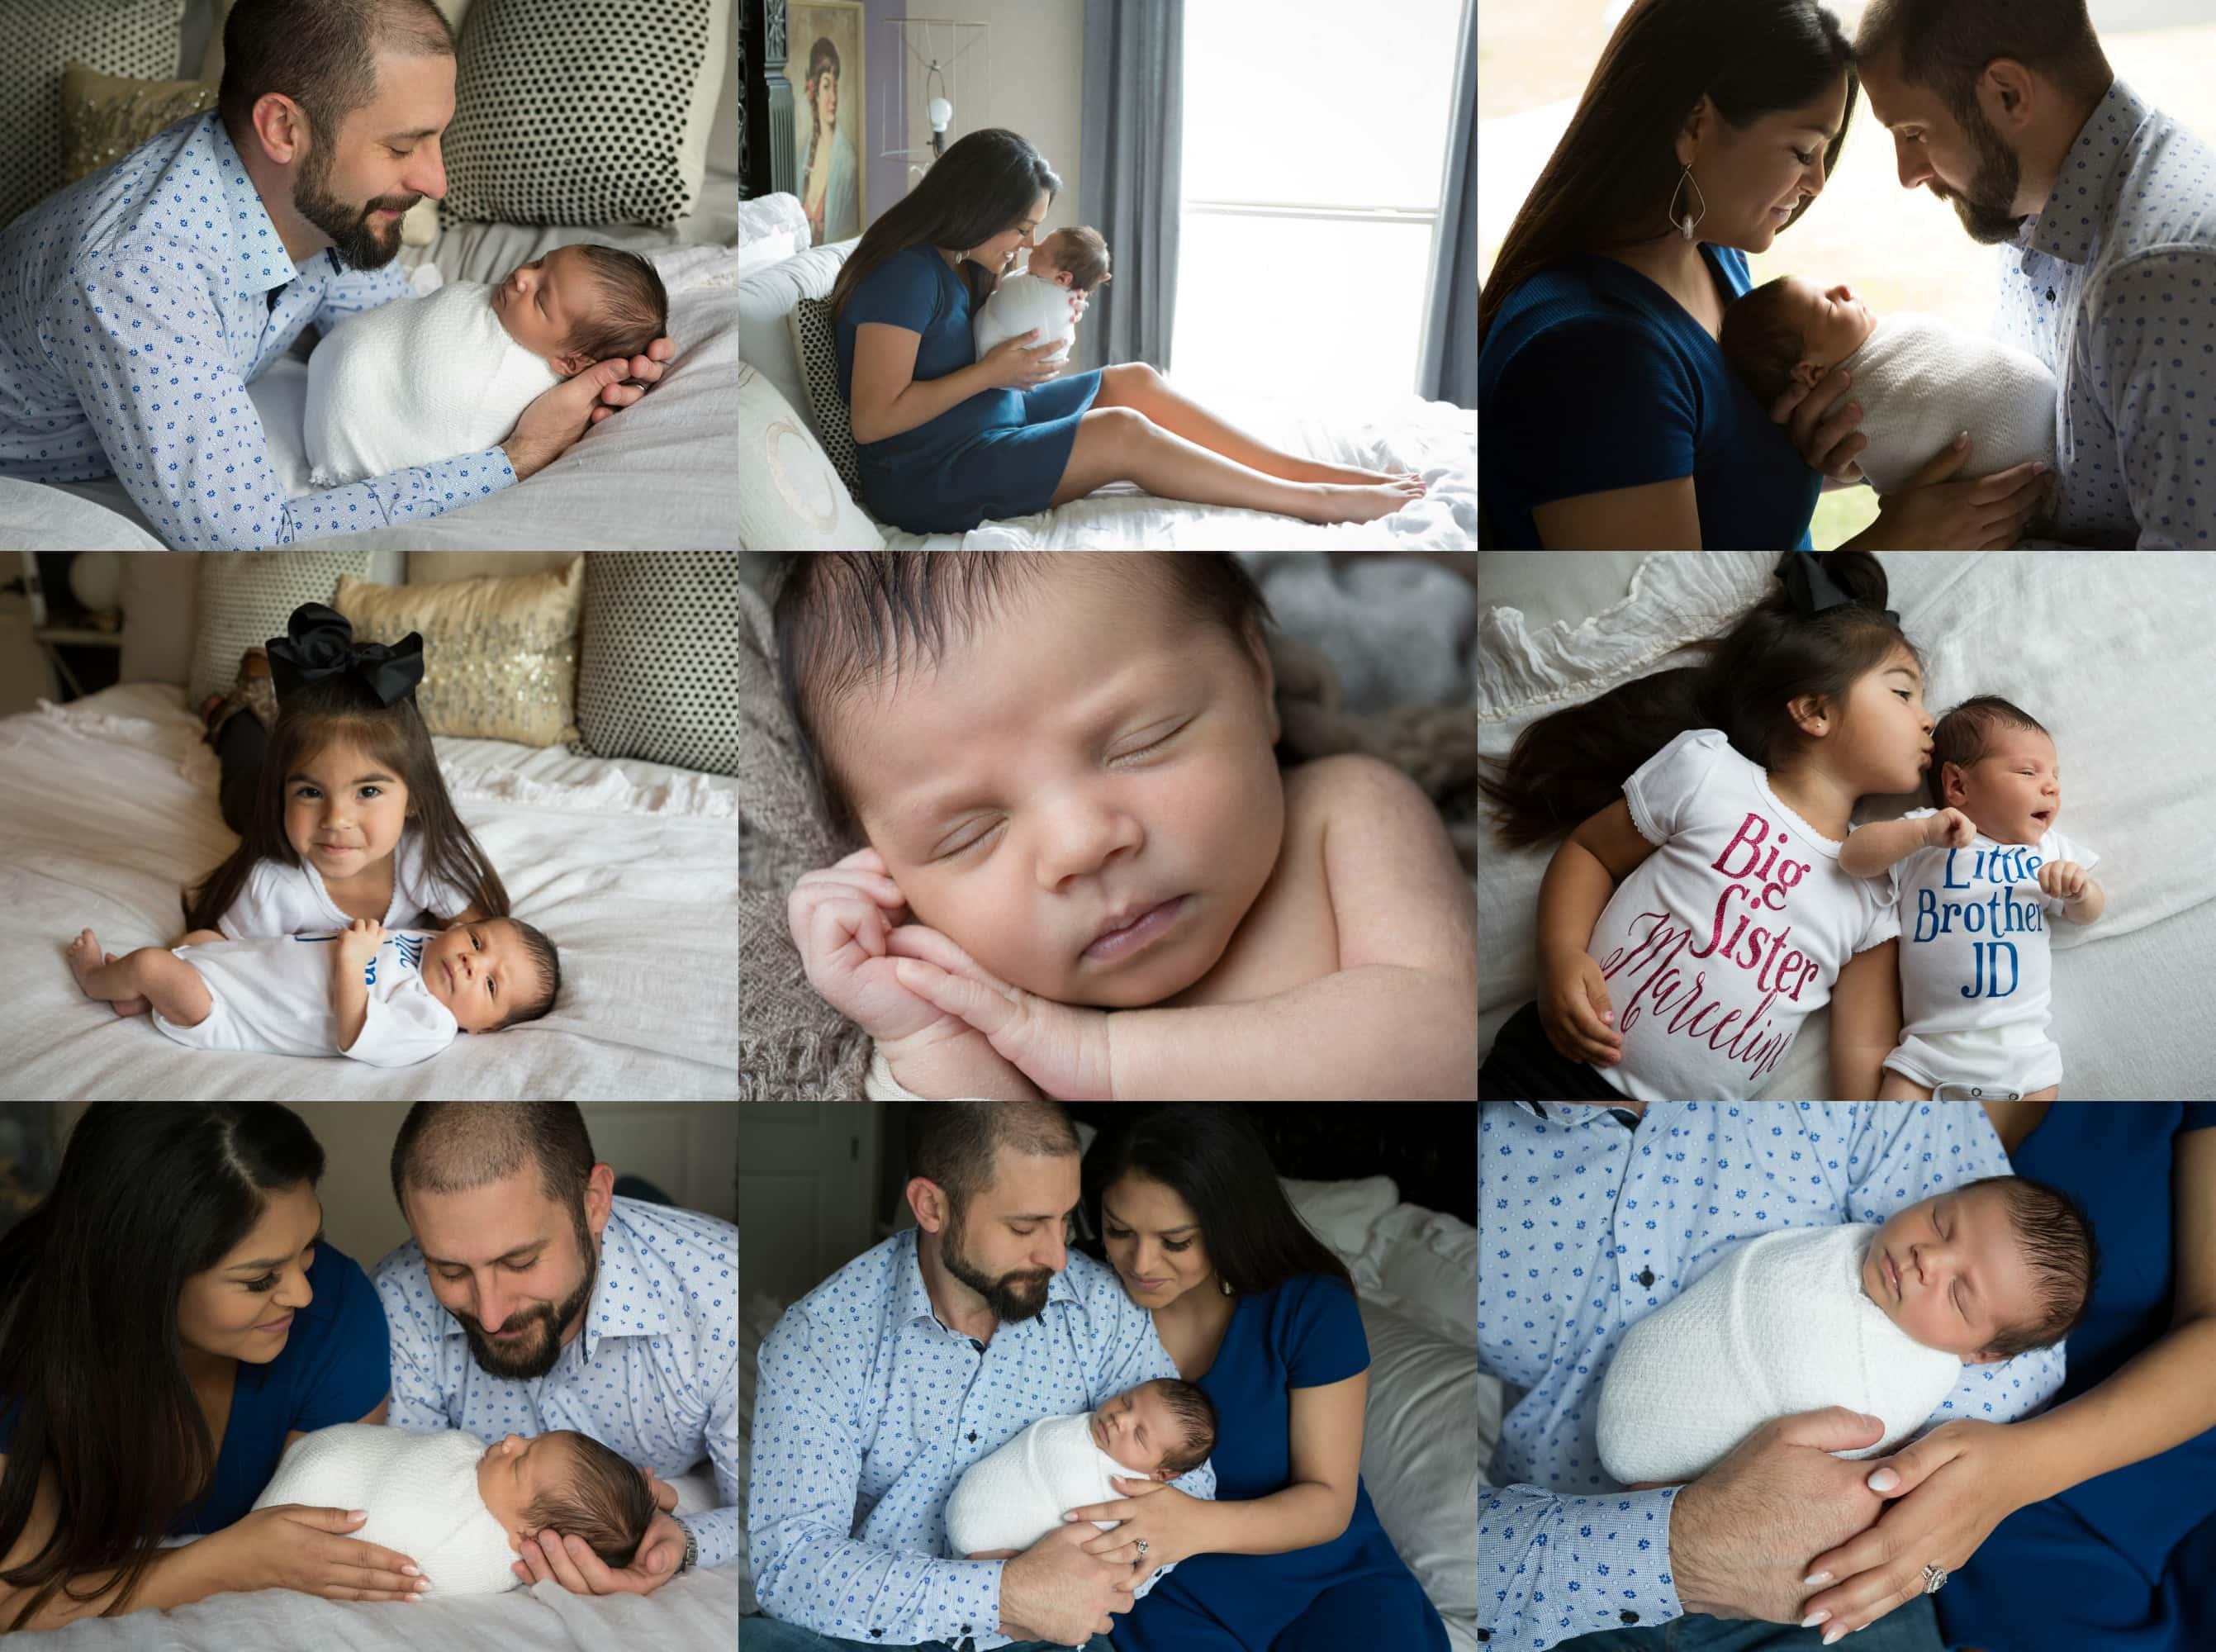 newborn boy at home in South Texas, baby boy sleeping during newborn photos at home